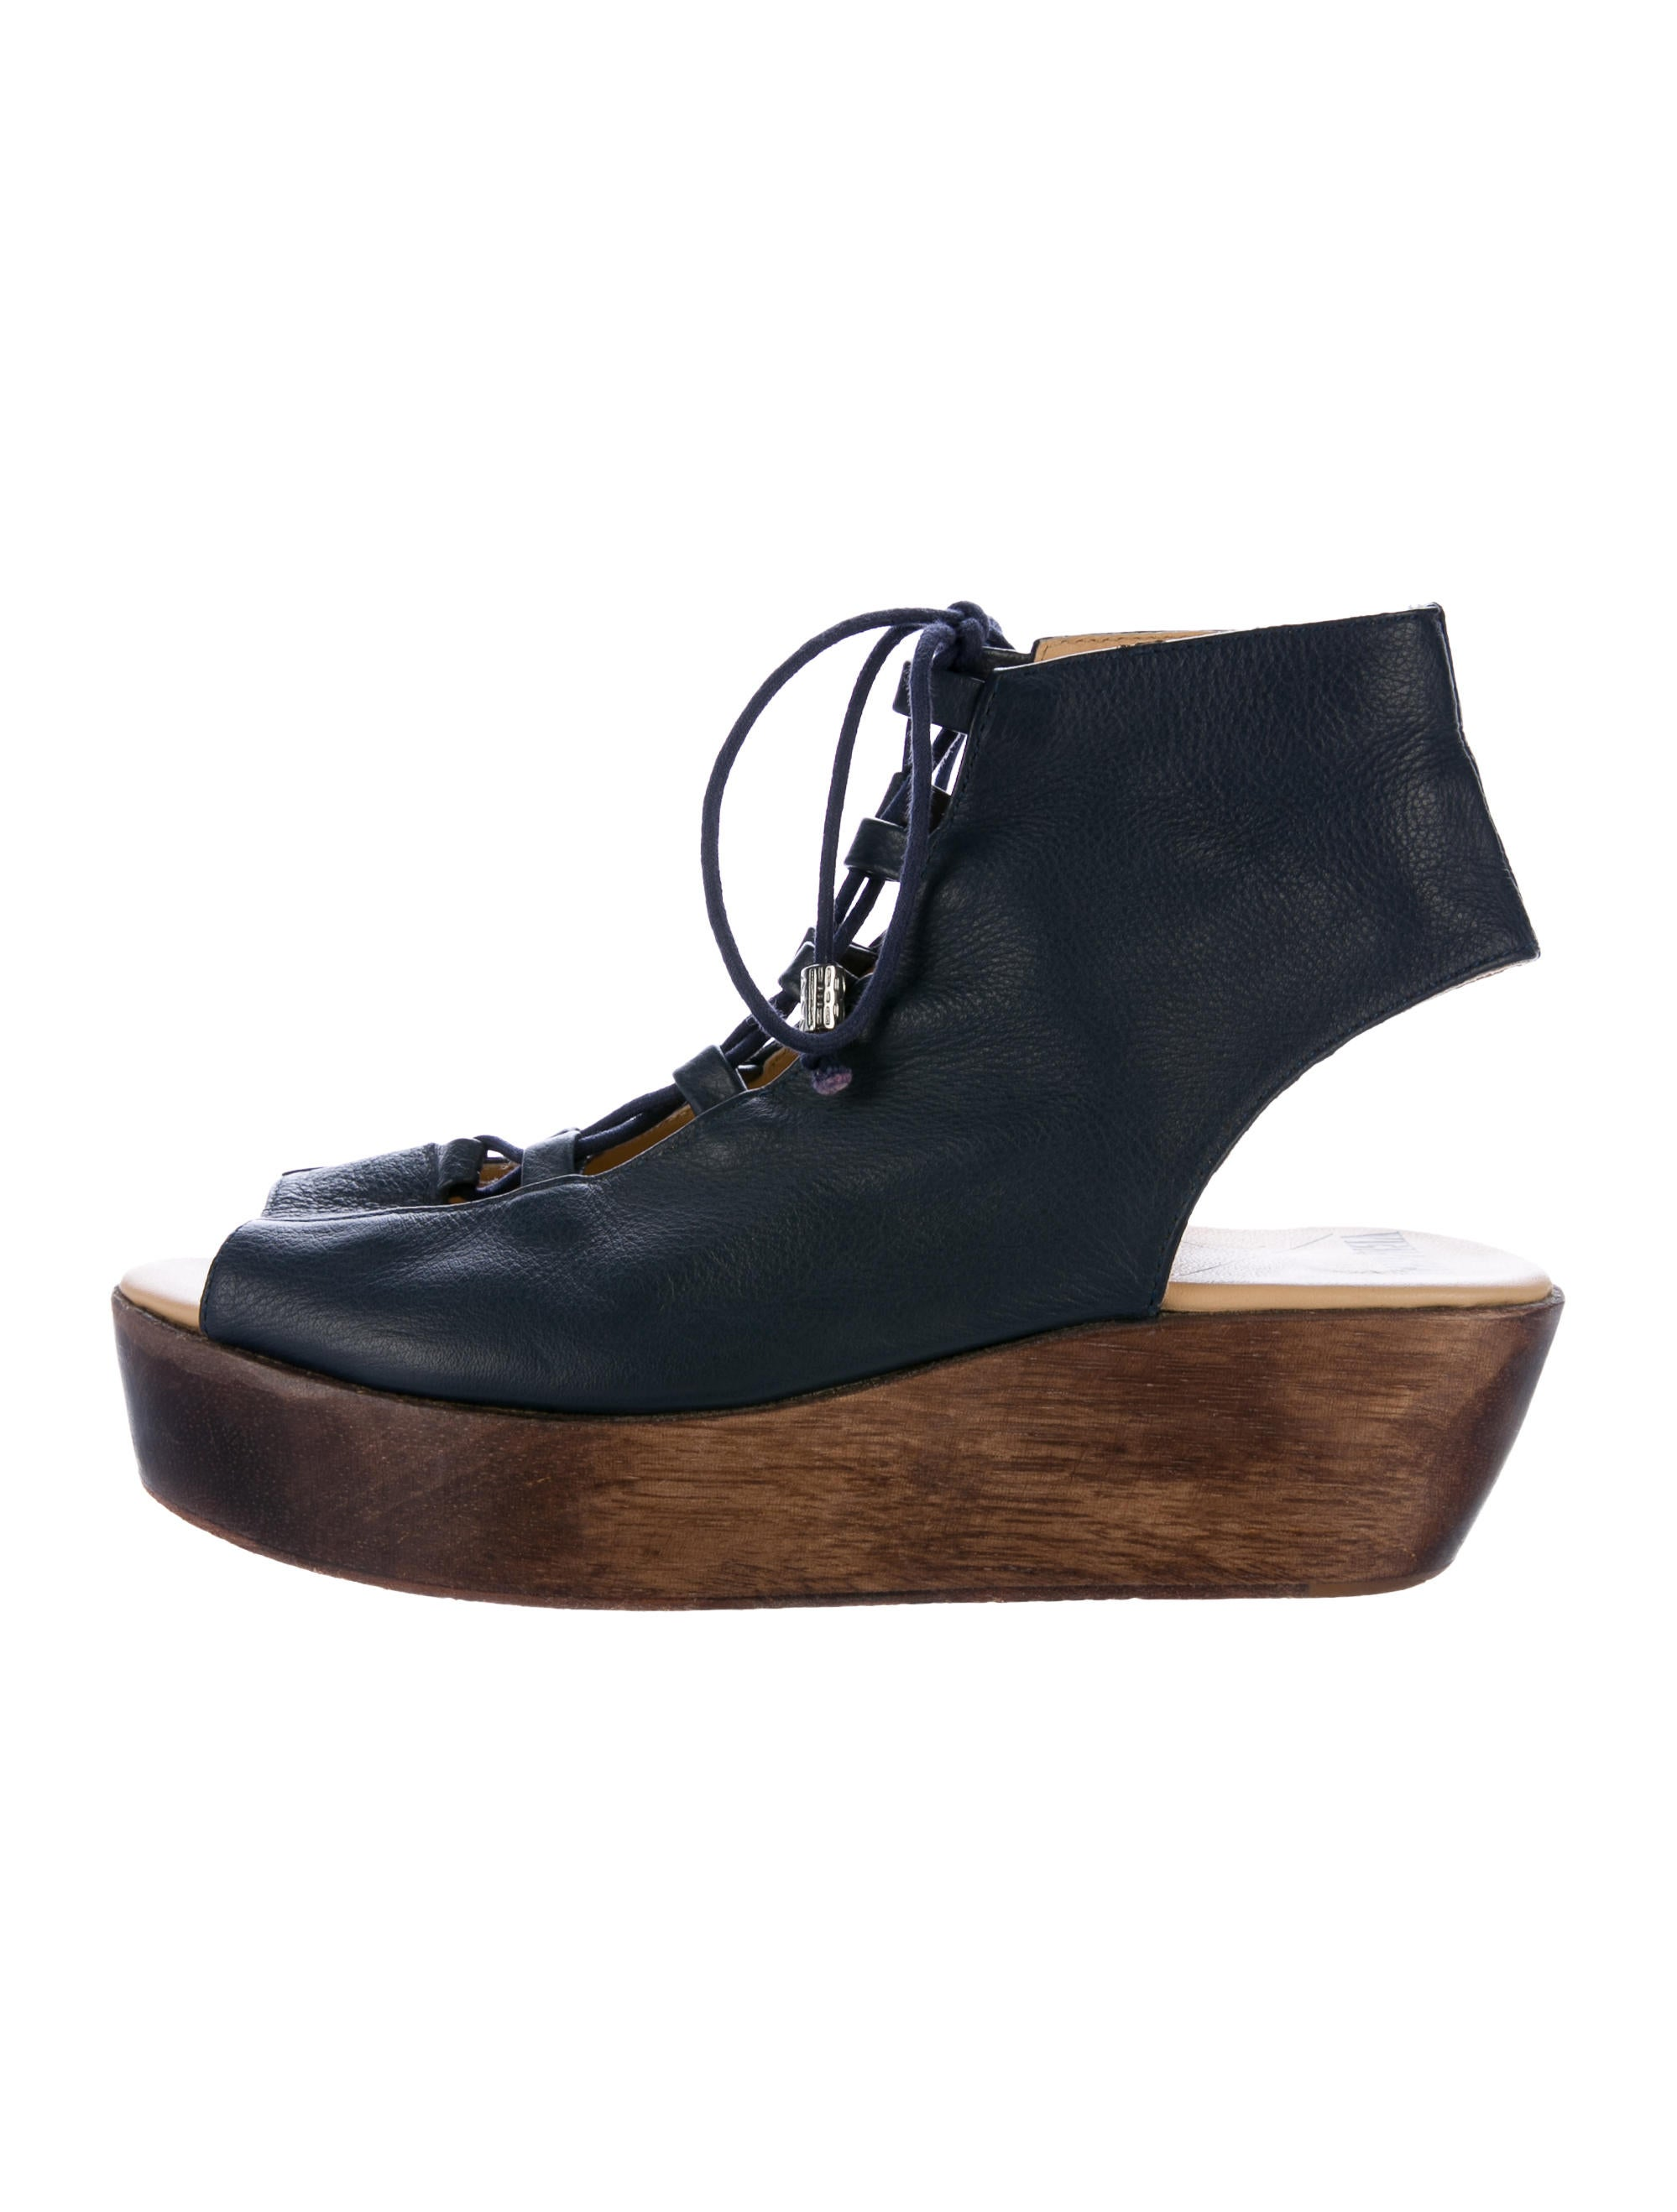 Vena Cava Leather Lace-Up Sandals cheap sale 100% guaranteed latest for sale cheap sale best sale collections online ccqZ2s93